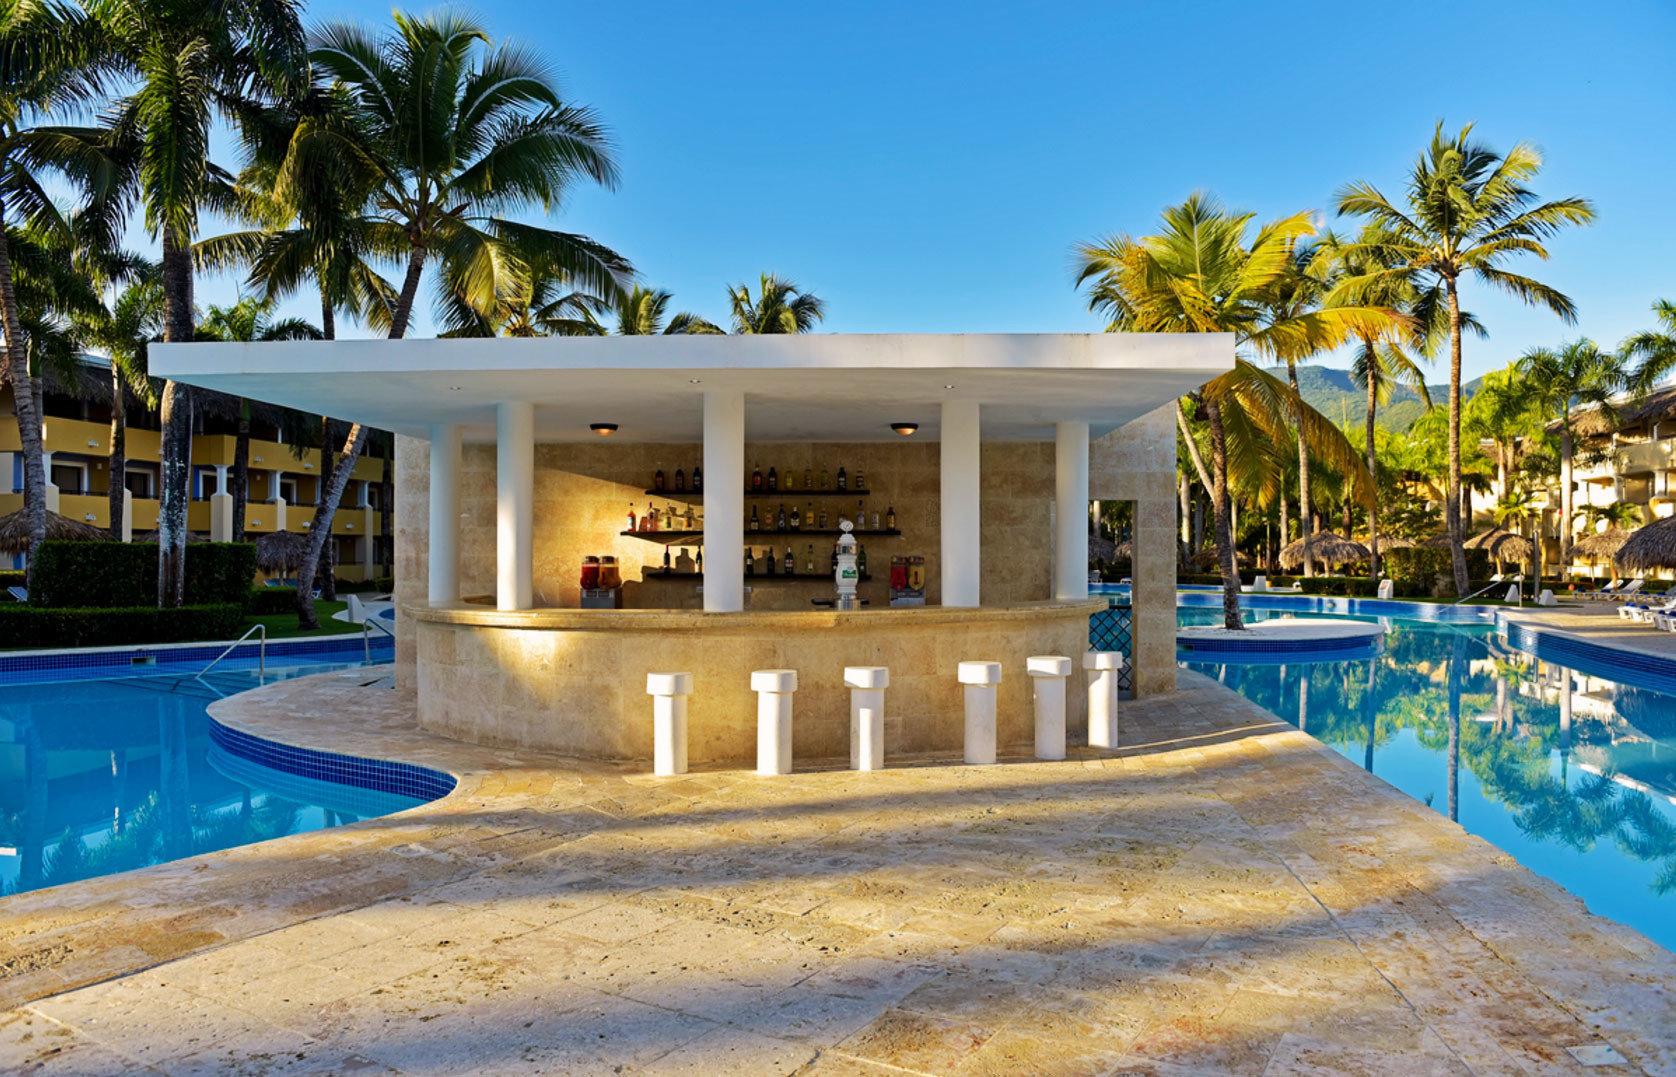 tree Resort Pool swimming pool leisure property blue home resort town Villa mansion palm caribbean condominium Beach swimming